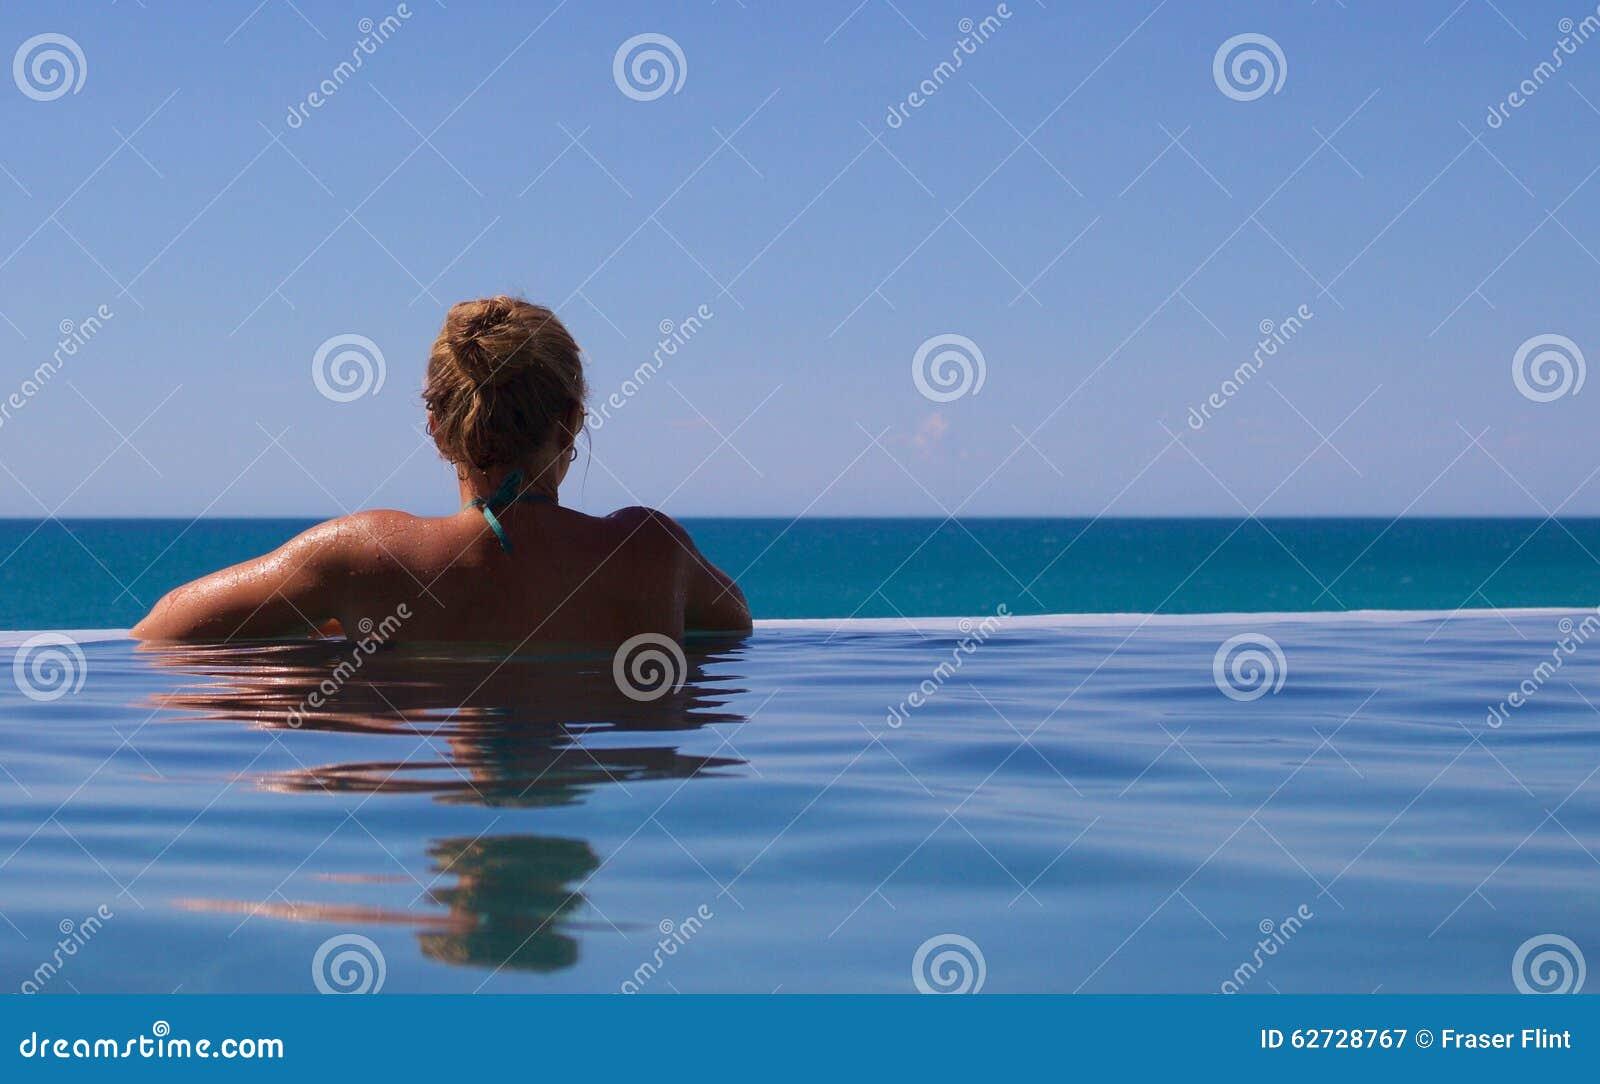 infinity pool overlooking ocean - photo #22